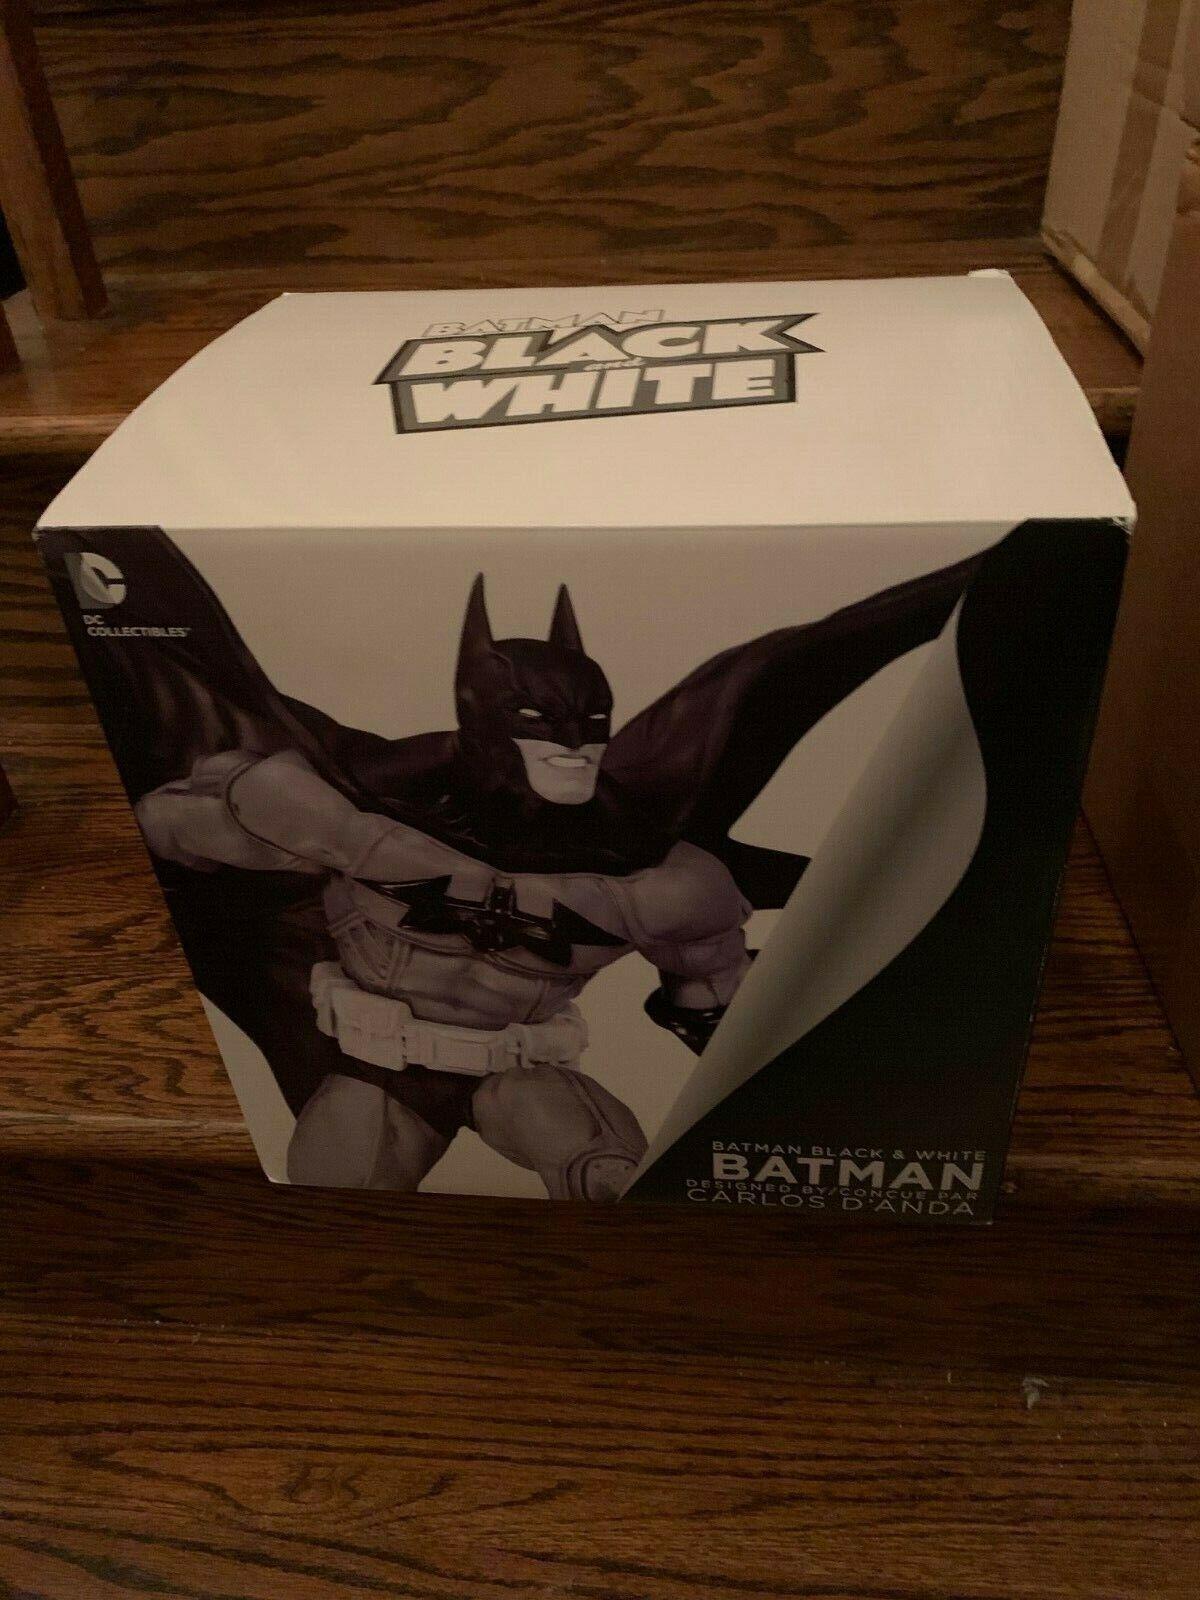 DC Comics Coleccionables Batman blancoo Y Negro Por Cochelos d'anda 8  Estatua